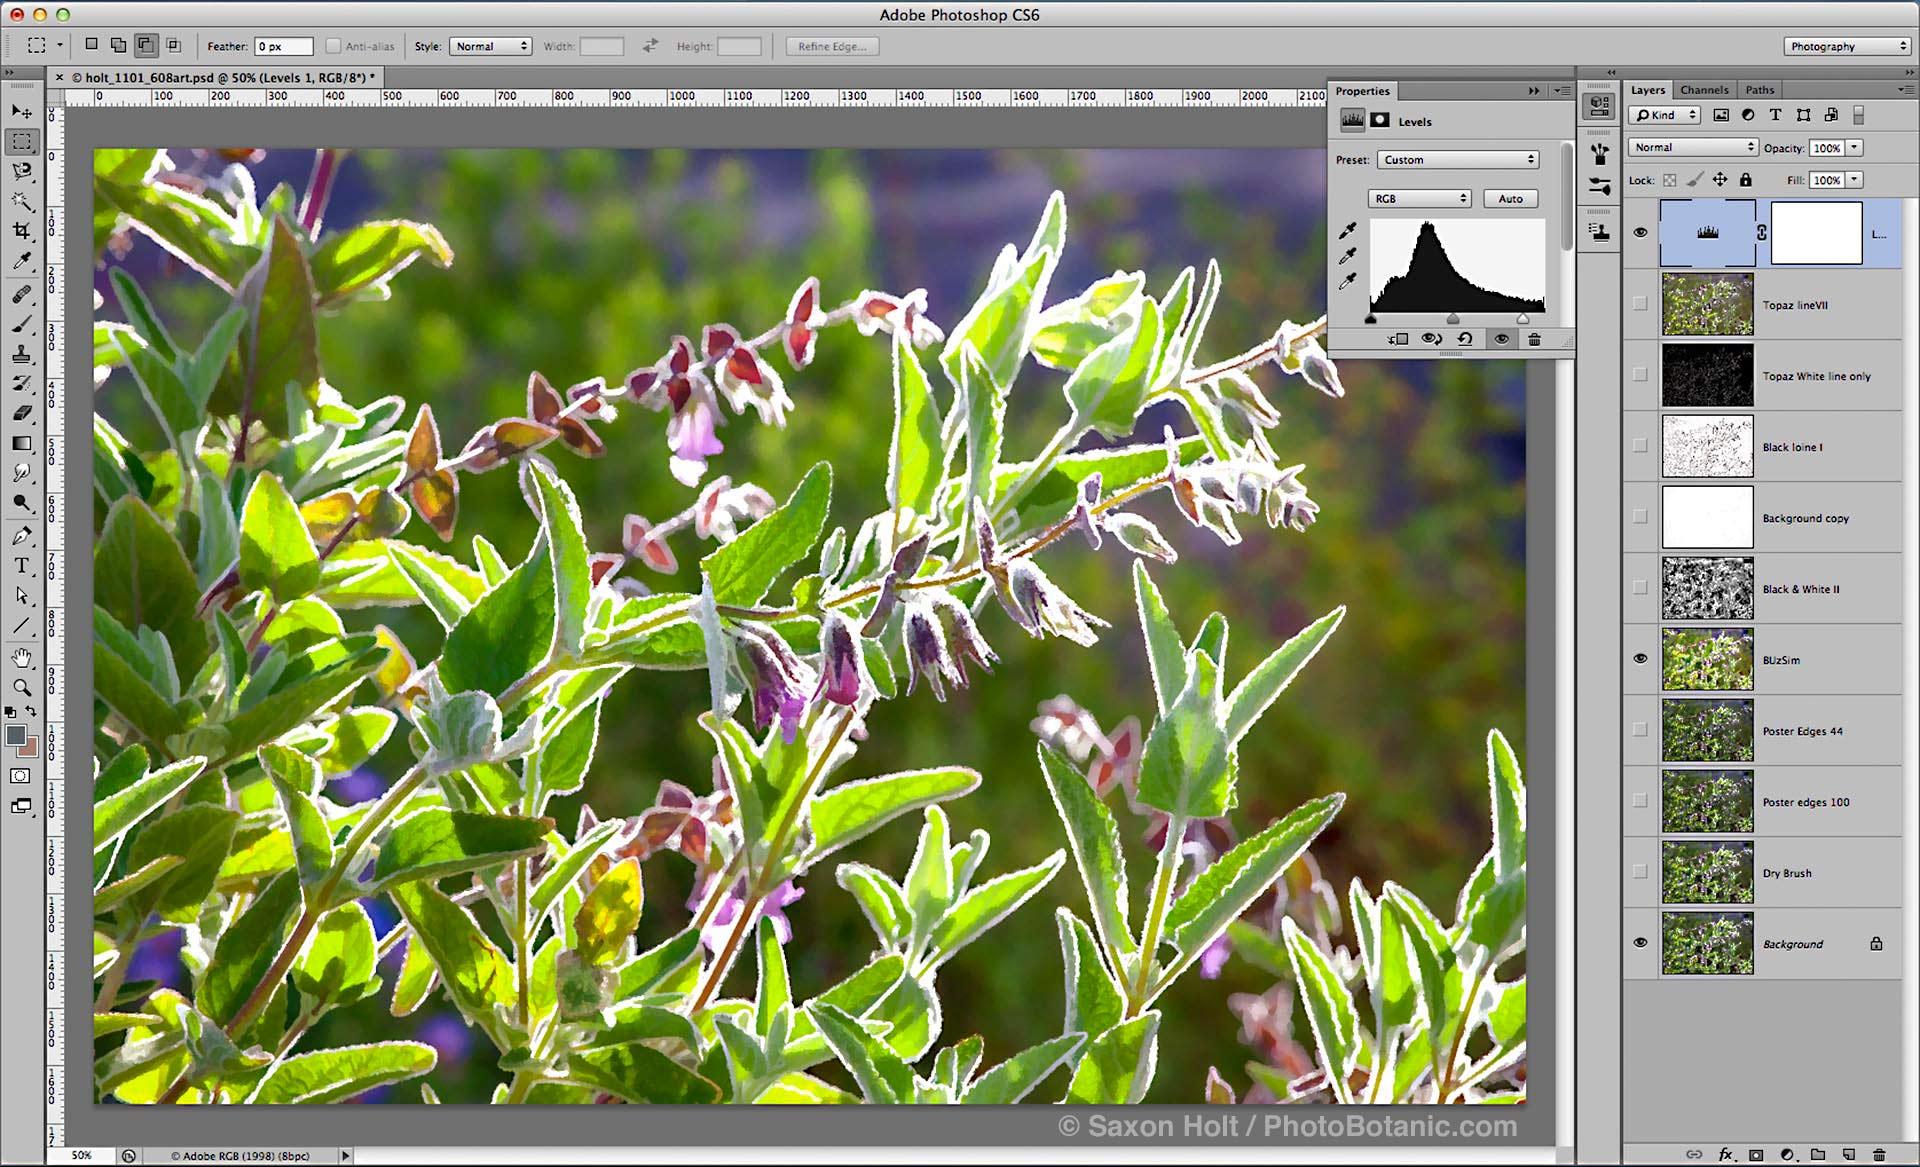 screenshot 1101_608art Lepichinia fragrans; photoshop filter options